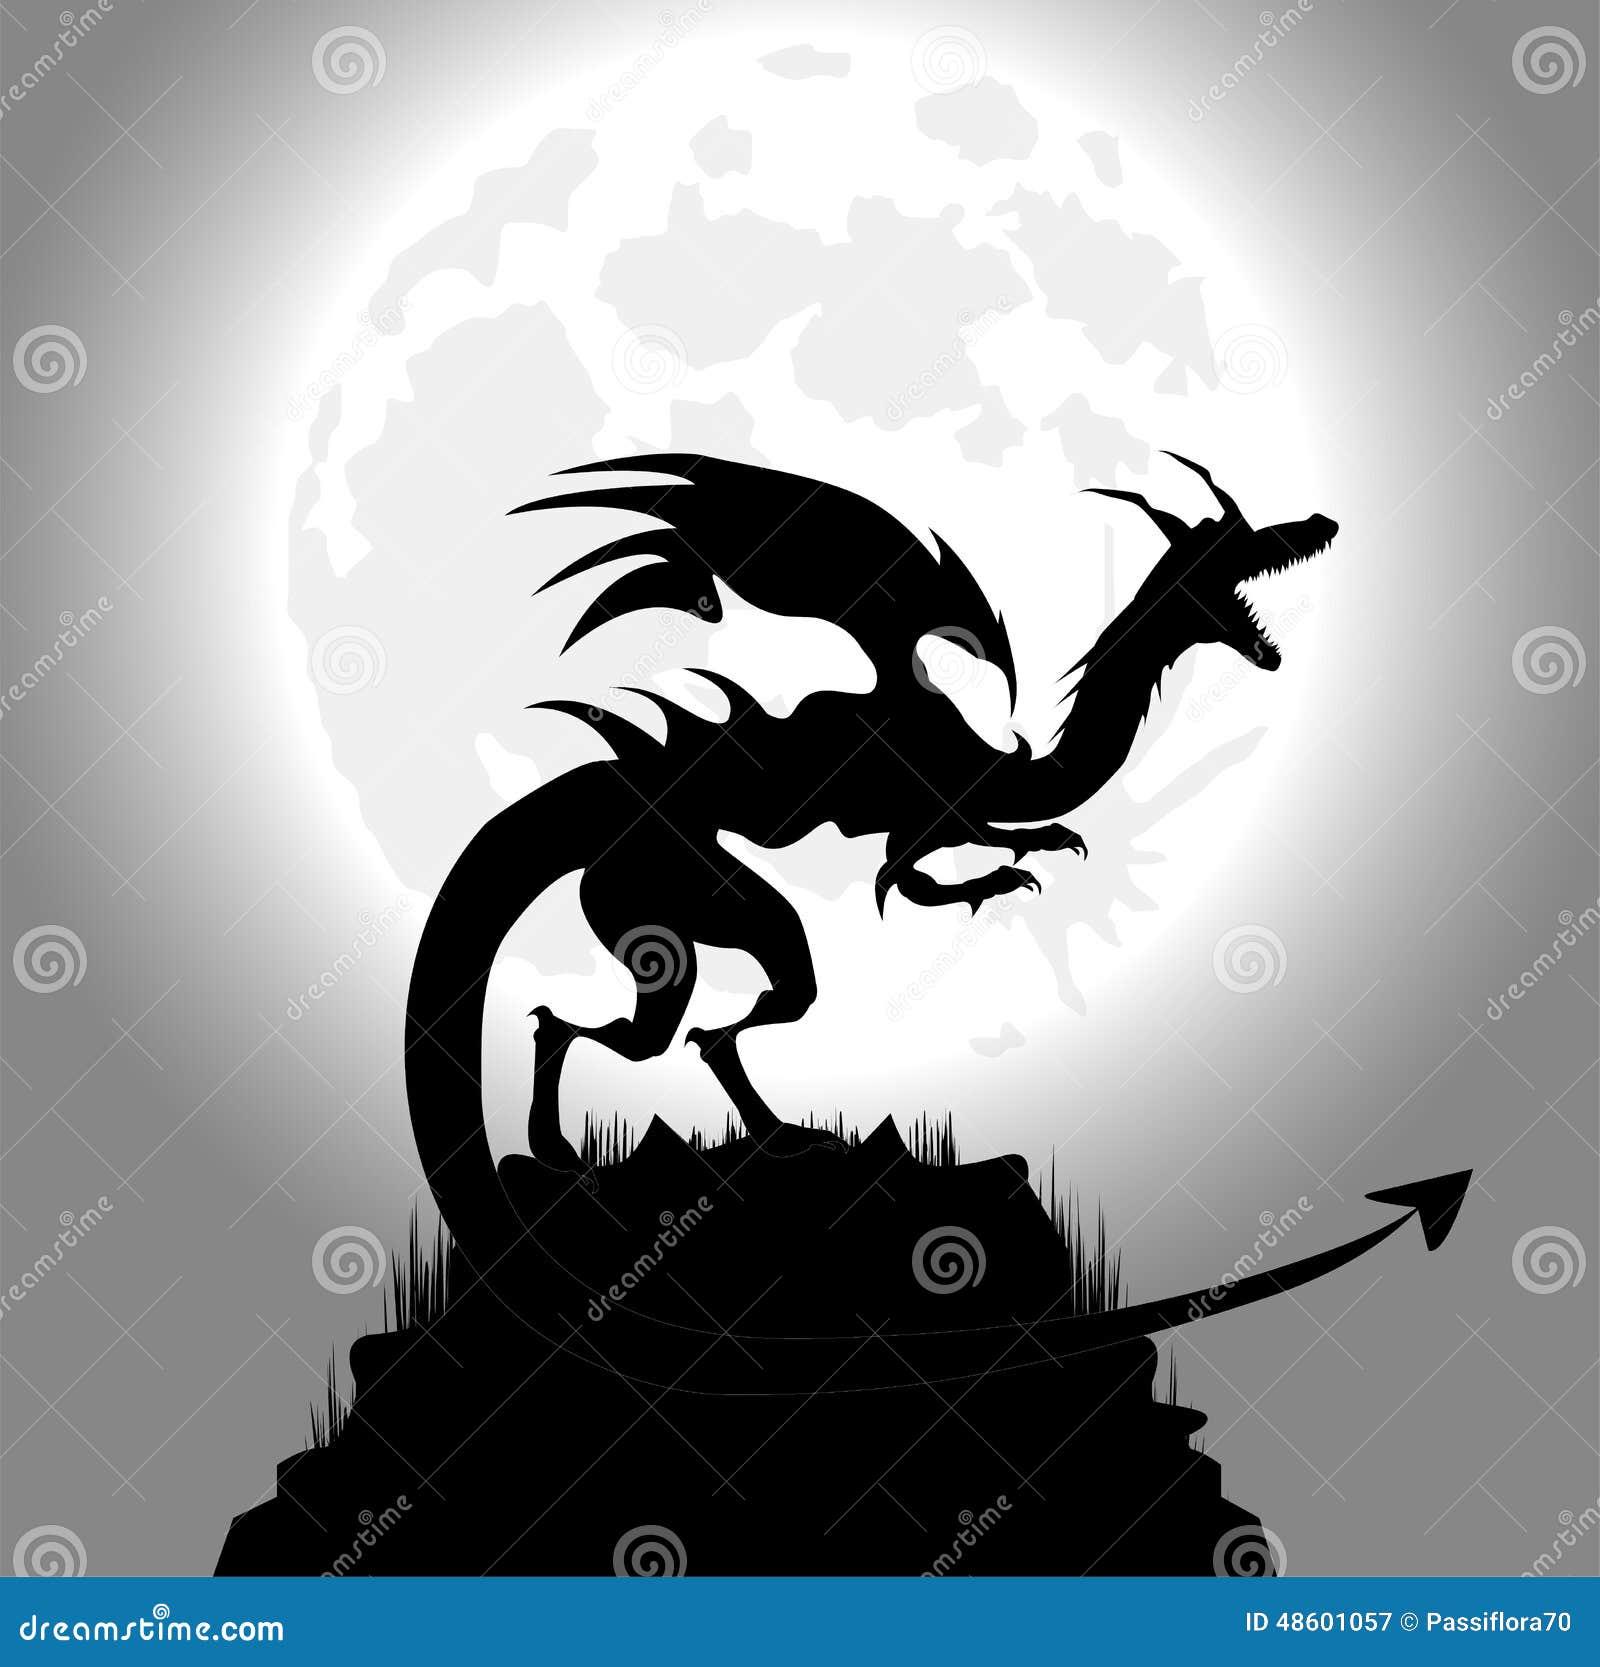 Full Moon Dragon: Dragon In The Night Stock Vector. Illustration Of Steering